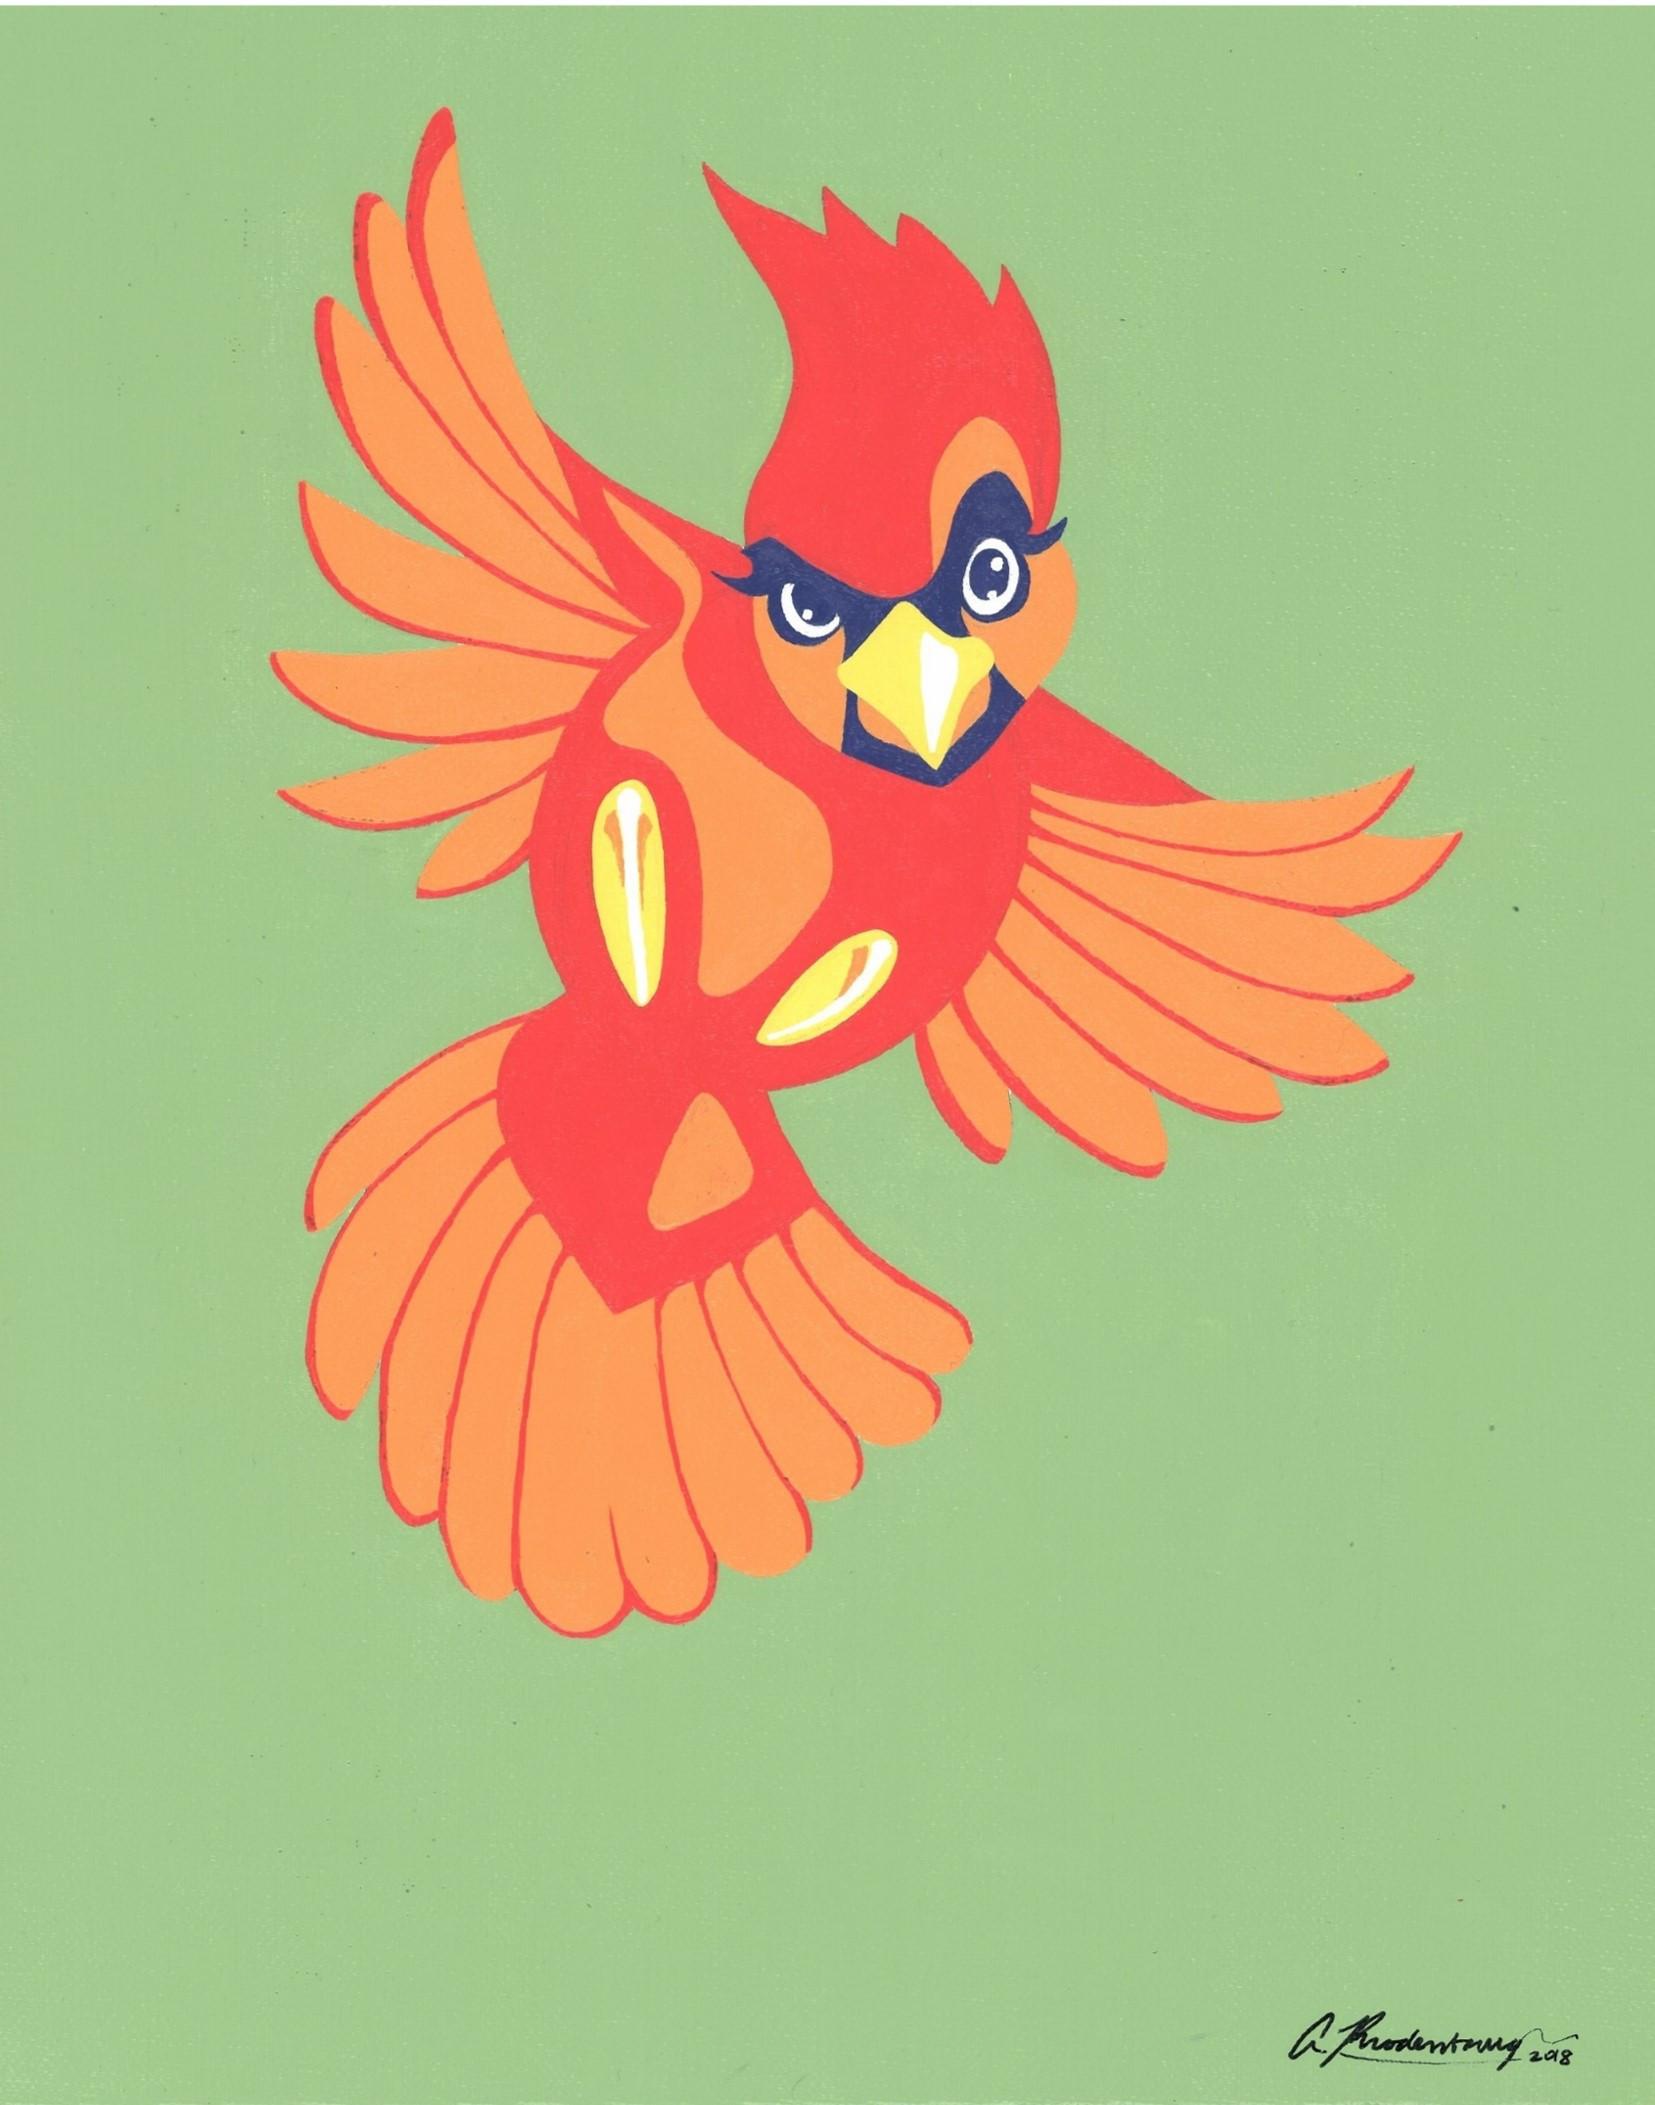 """Ballsy Cardinal"" St. Louis Red Green Animal Pinup Painting"